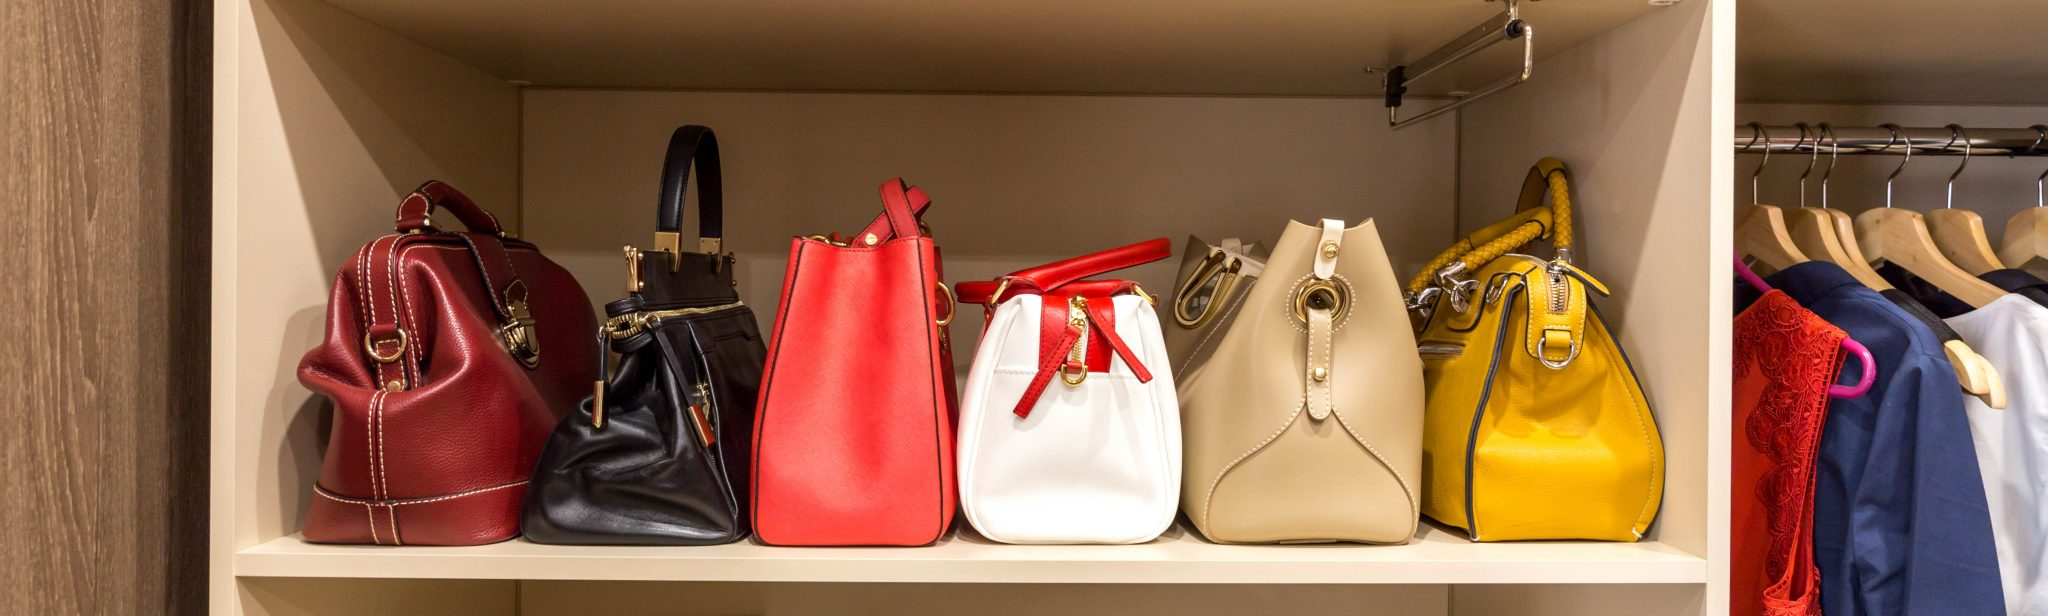 collection of handbags in woman`s wardrobe